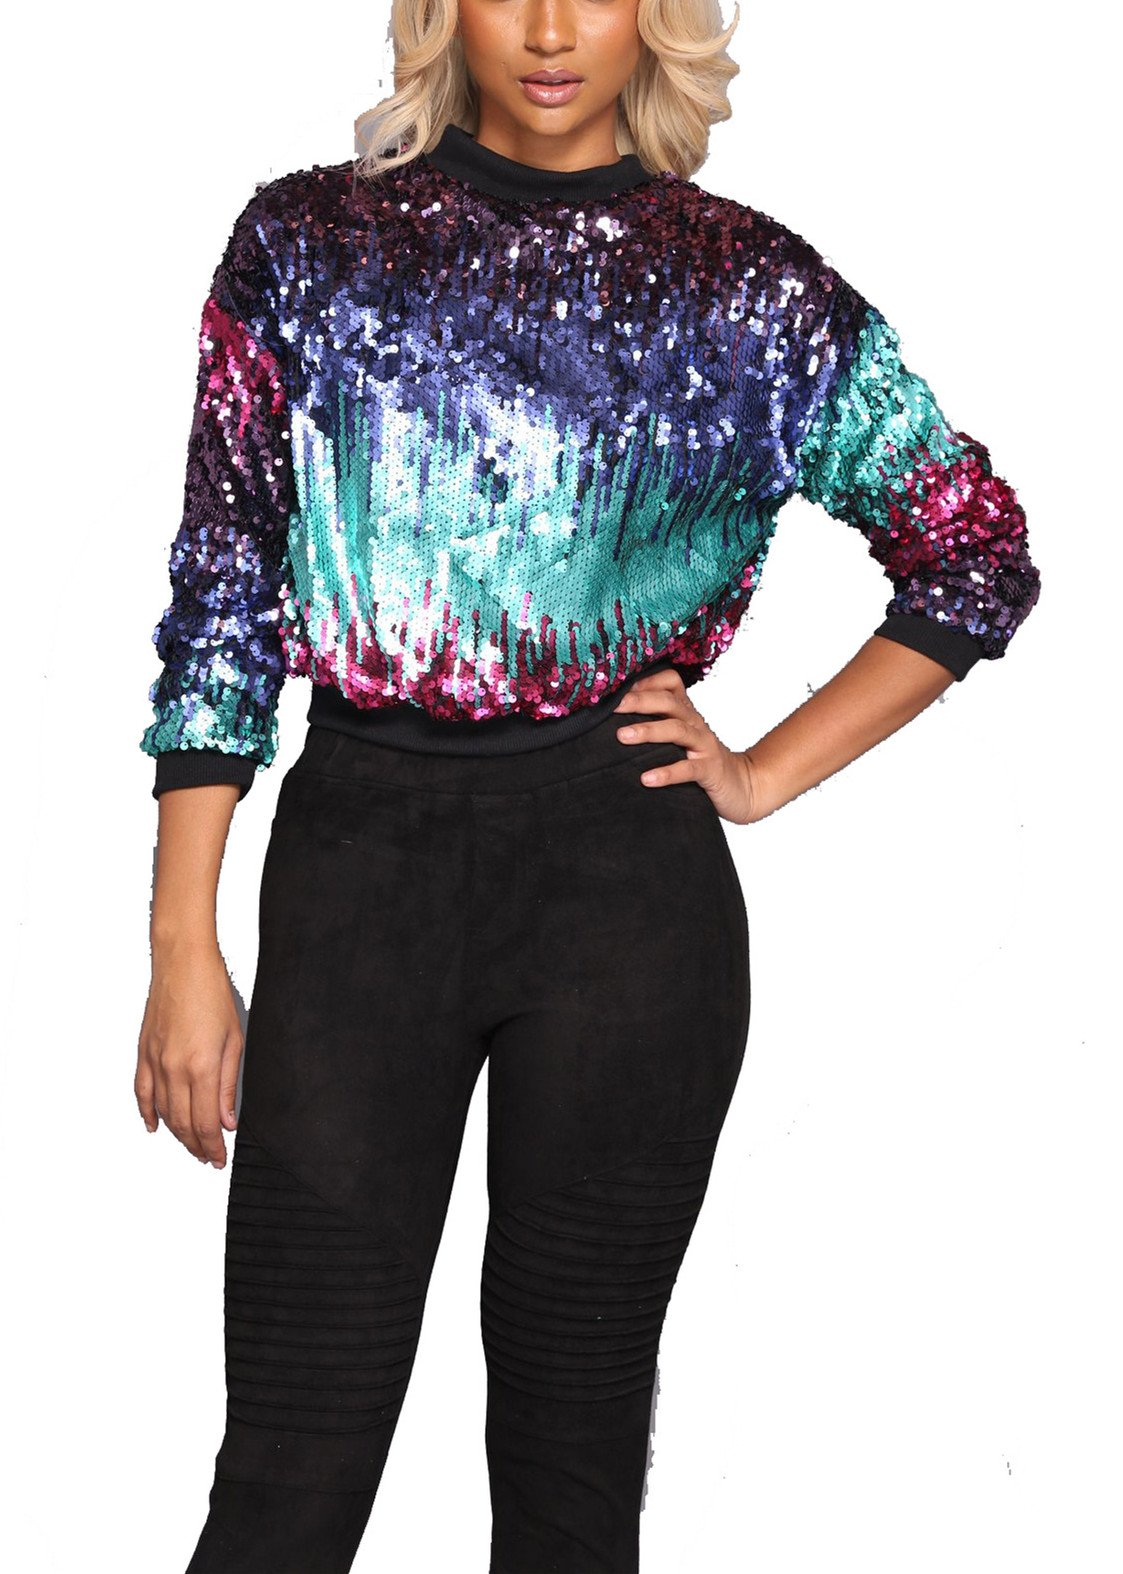 Women's Spring Autumn Fashion Stunning Sequins Pullover Sweatshirt Tunic Tank Top Basic Shirts Blouse Club Dress XL